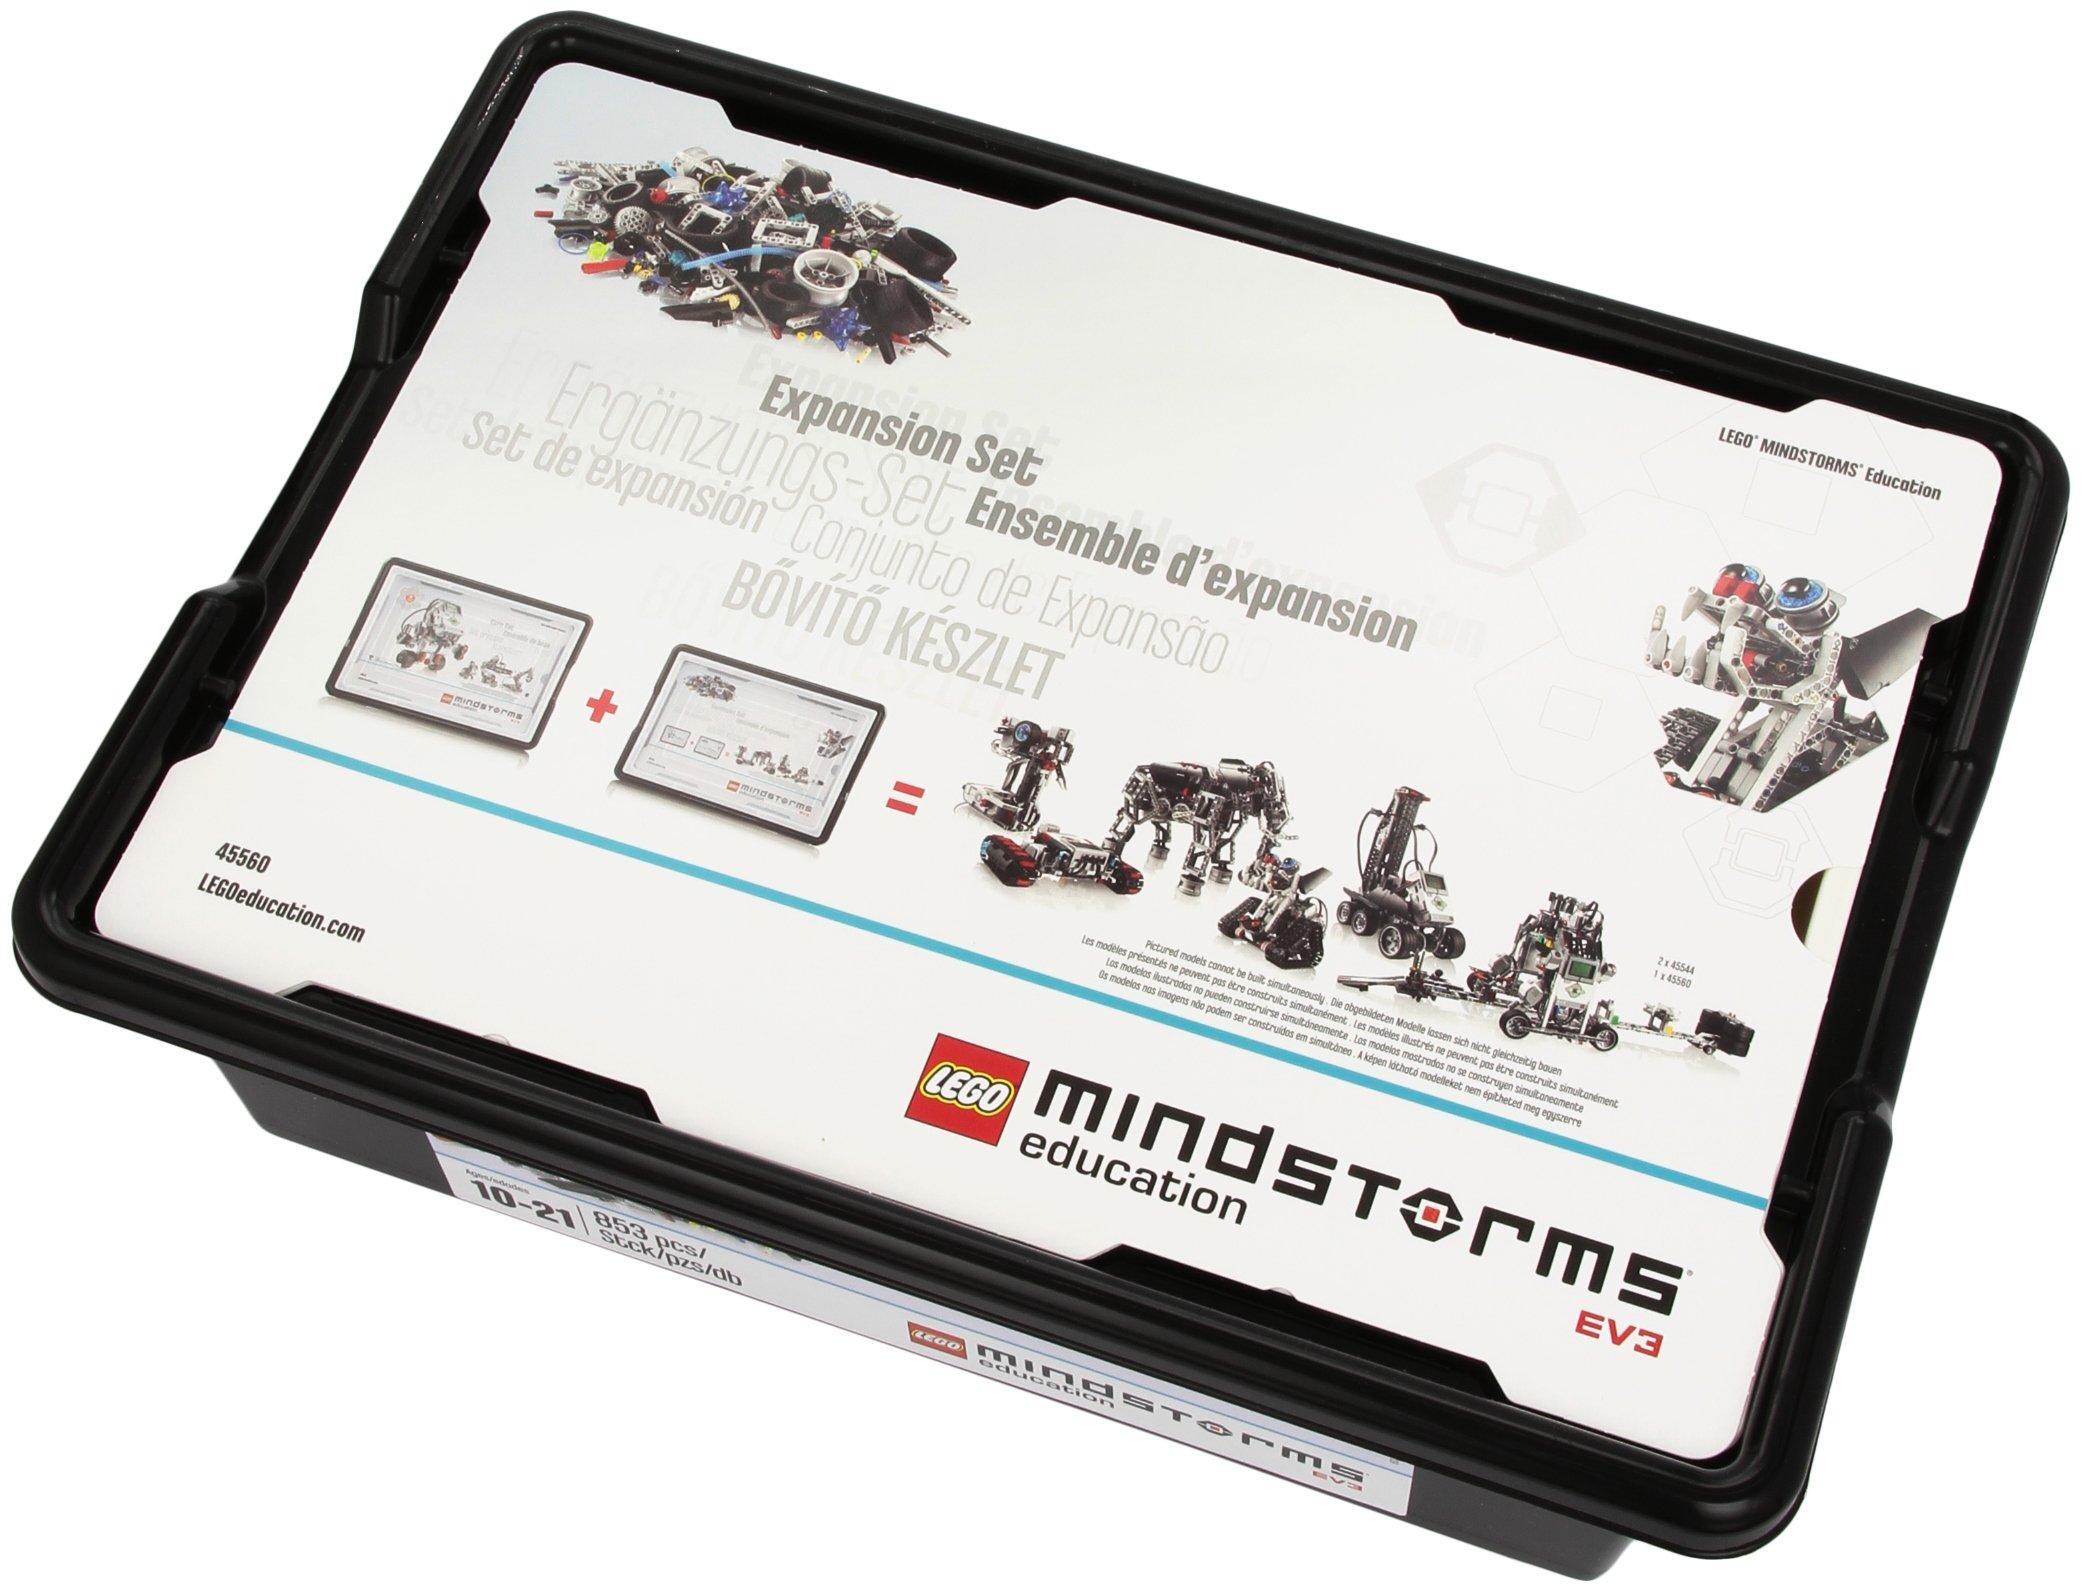 Set-di-espansione-EV3-LEGO-MINDSTORMS-Education